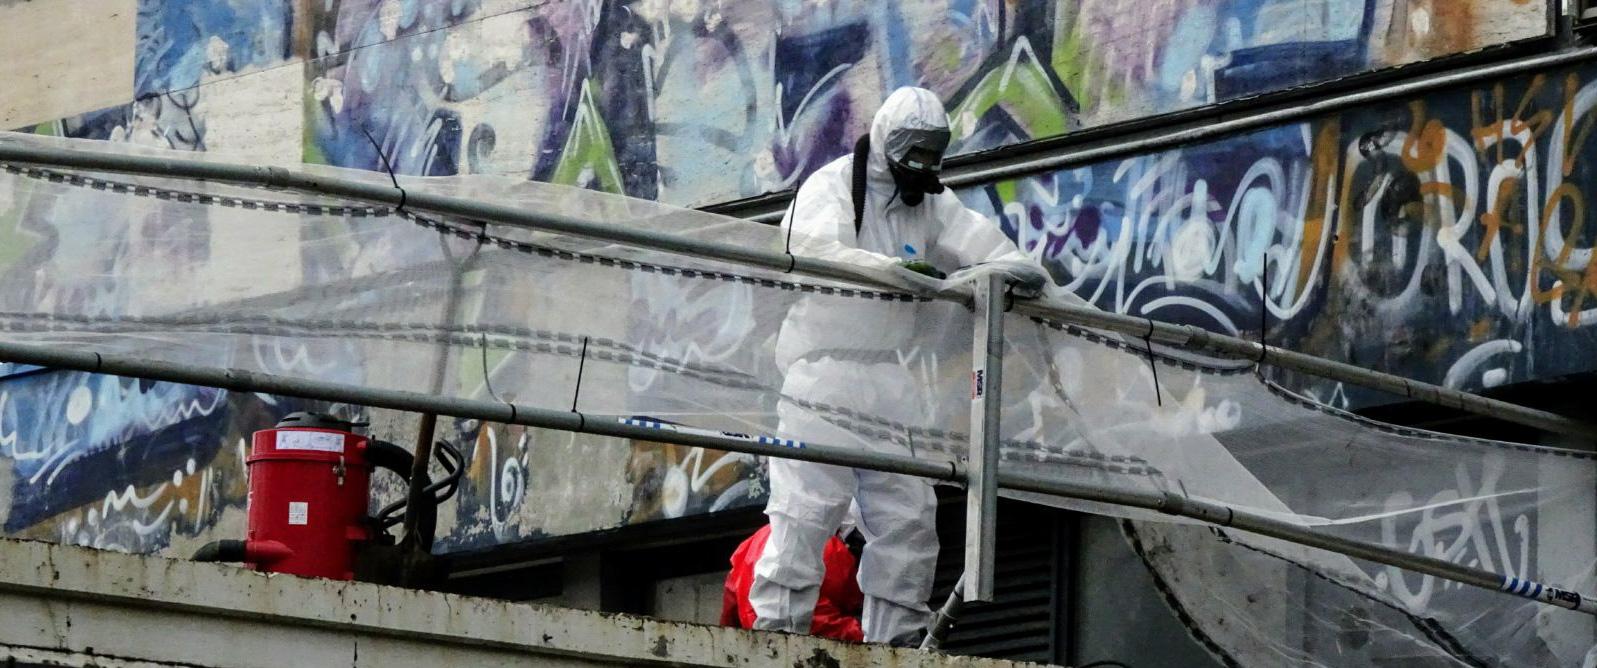 Buitensanering asbest